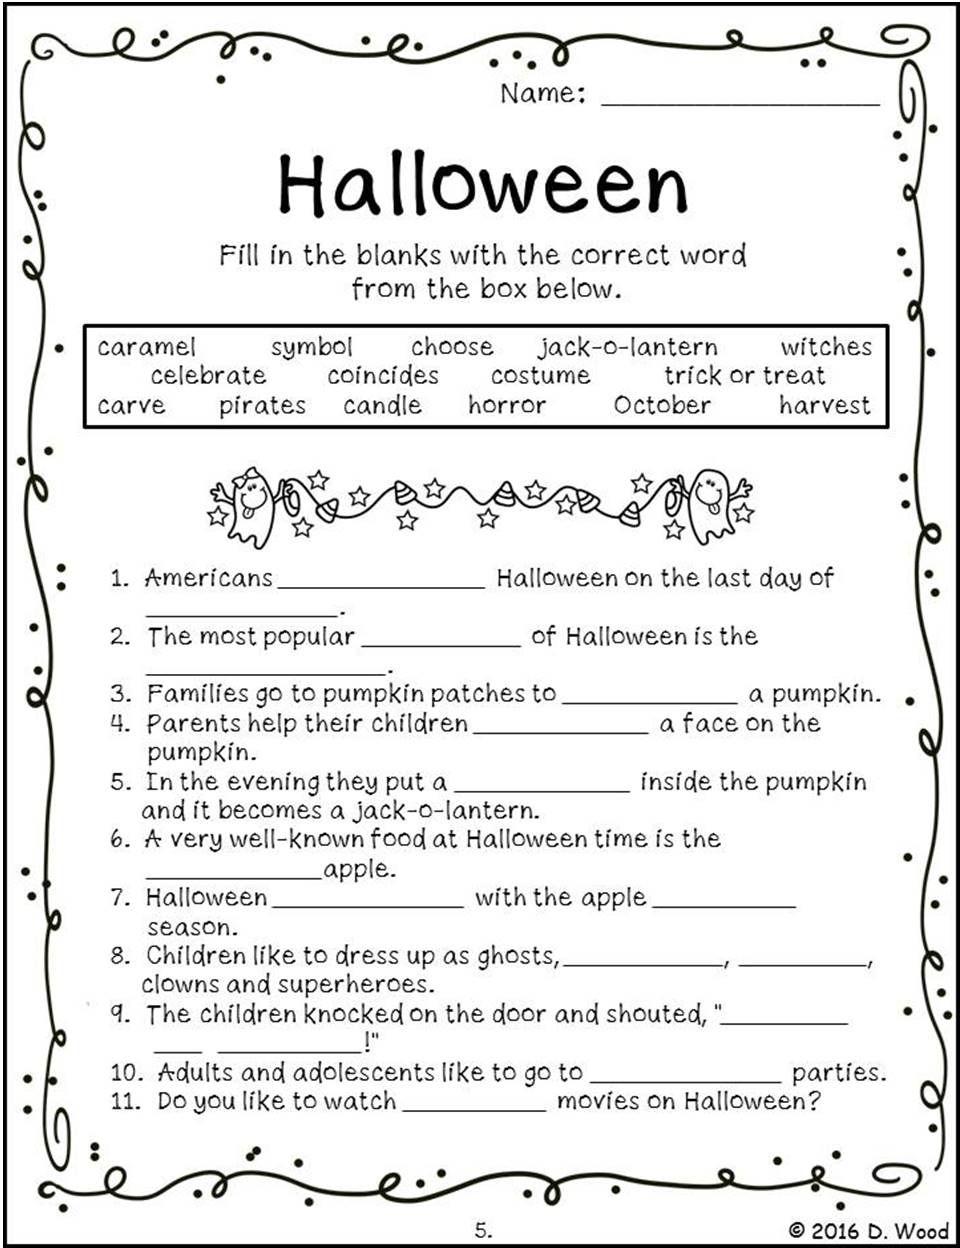 Halloween reading comprehension vocabulary grammar puzzles halloween reading comprehension vocabulary grammar puzzles biocorpaavc Gallery